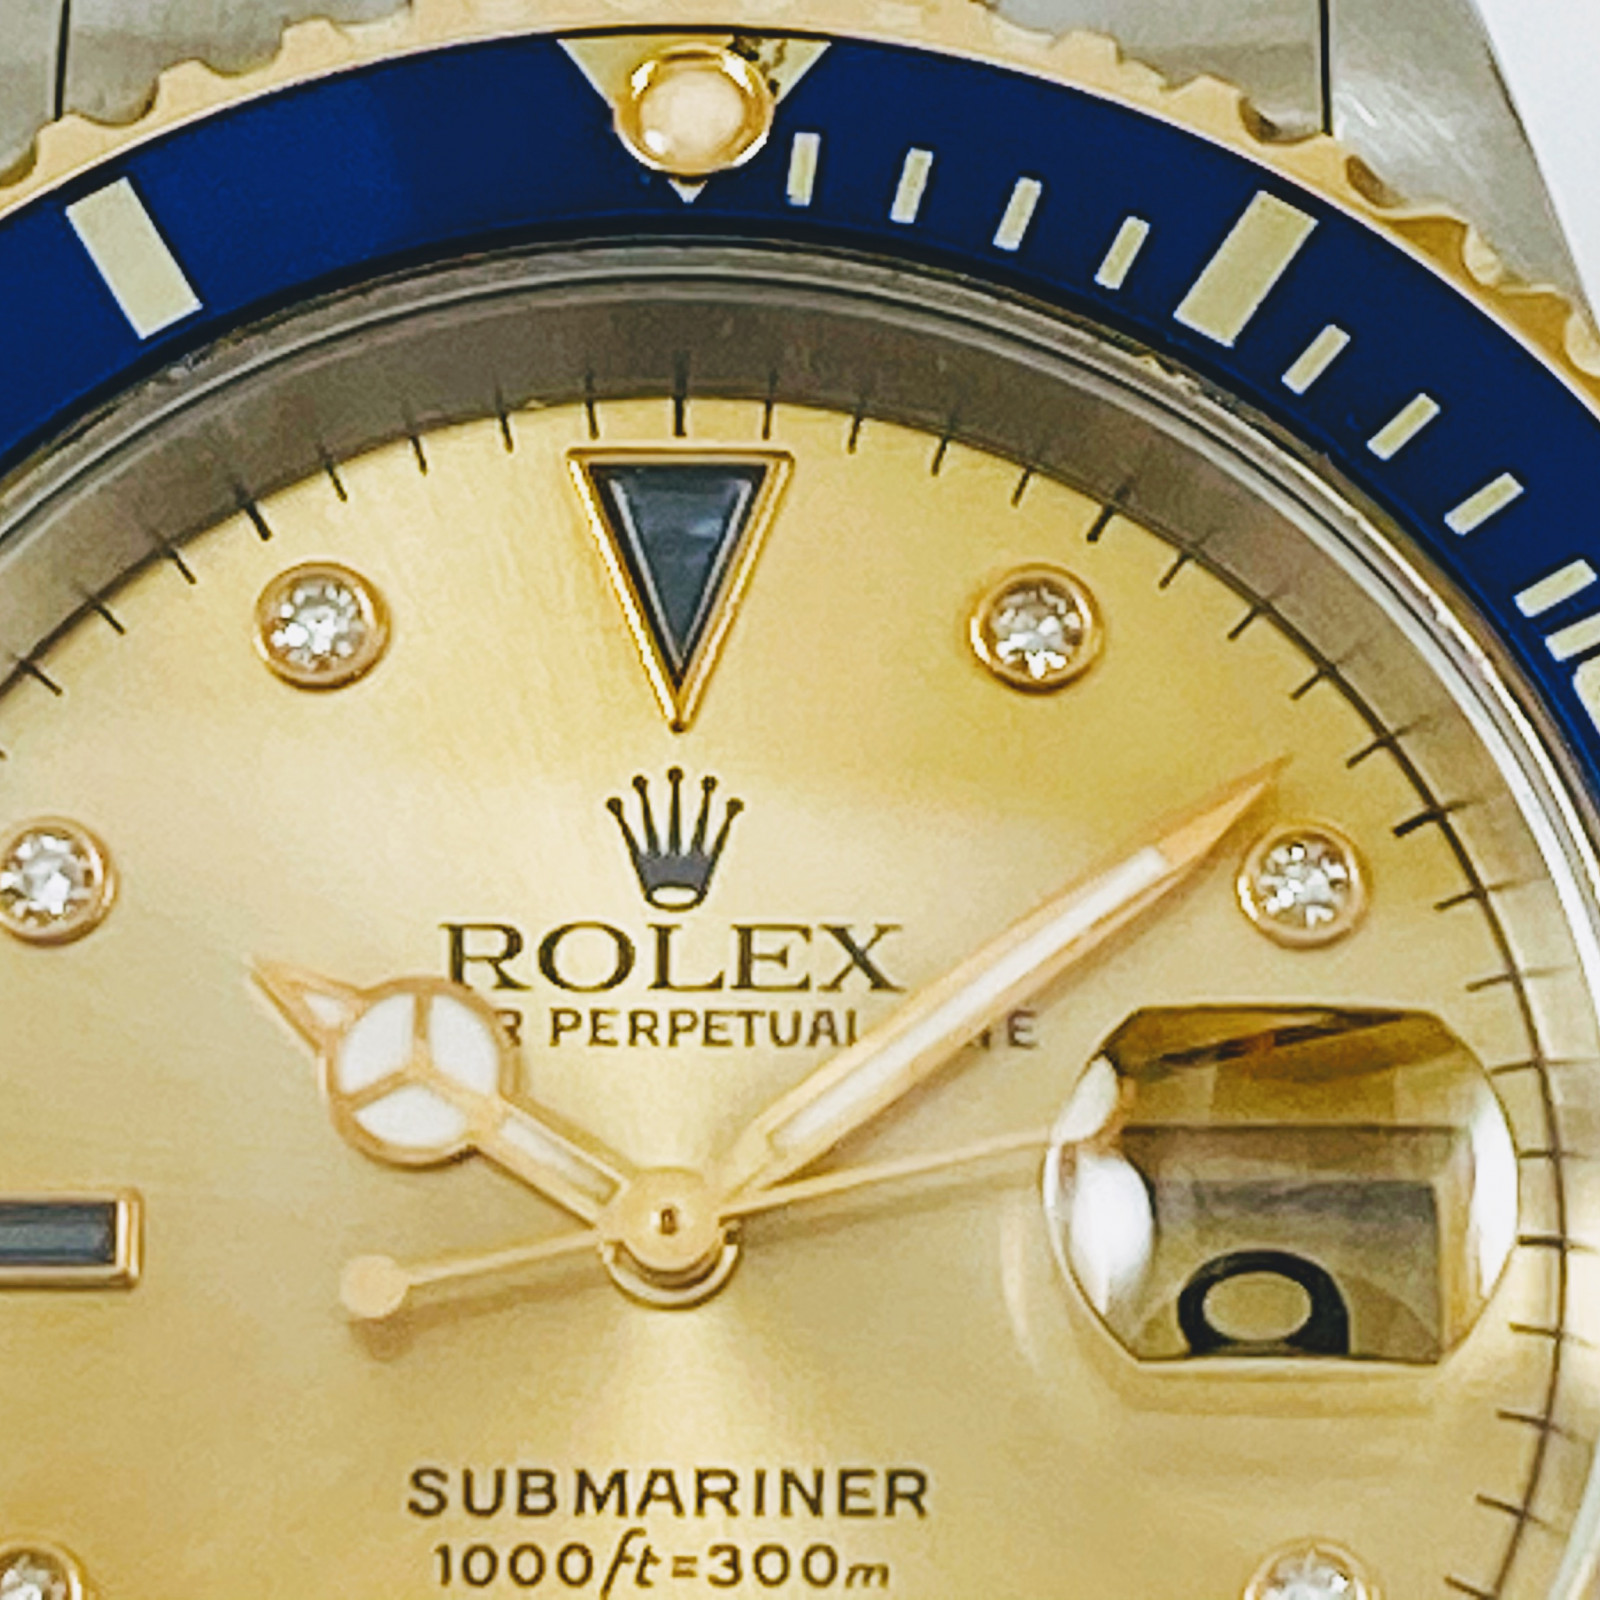 Pre-Owned Rolex Submariner 16613 Serti Dial